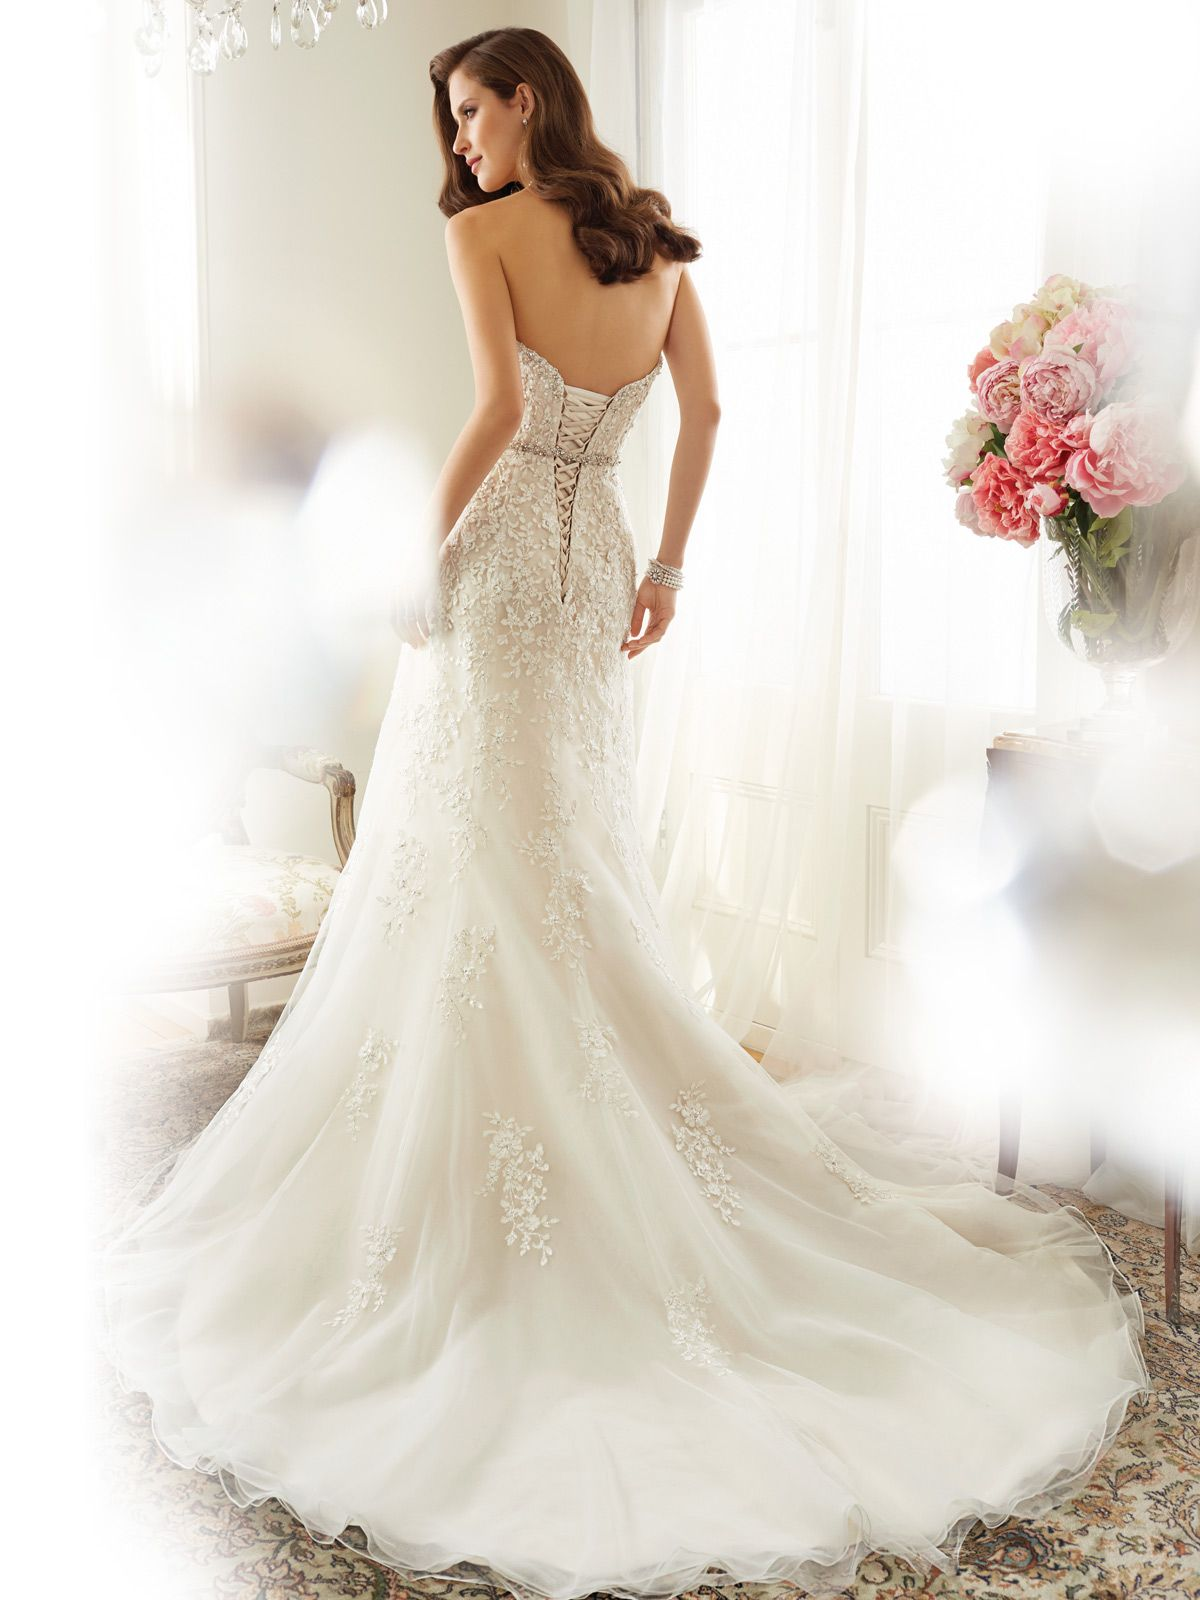 ALine Wedding Dress with Strapless Neckline  Wedding dress